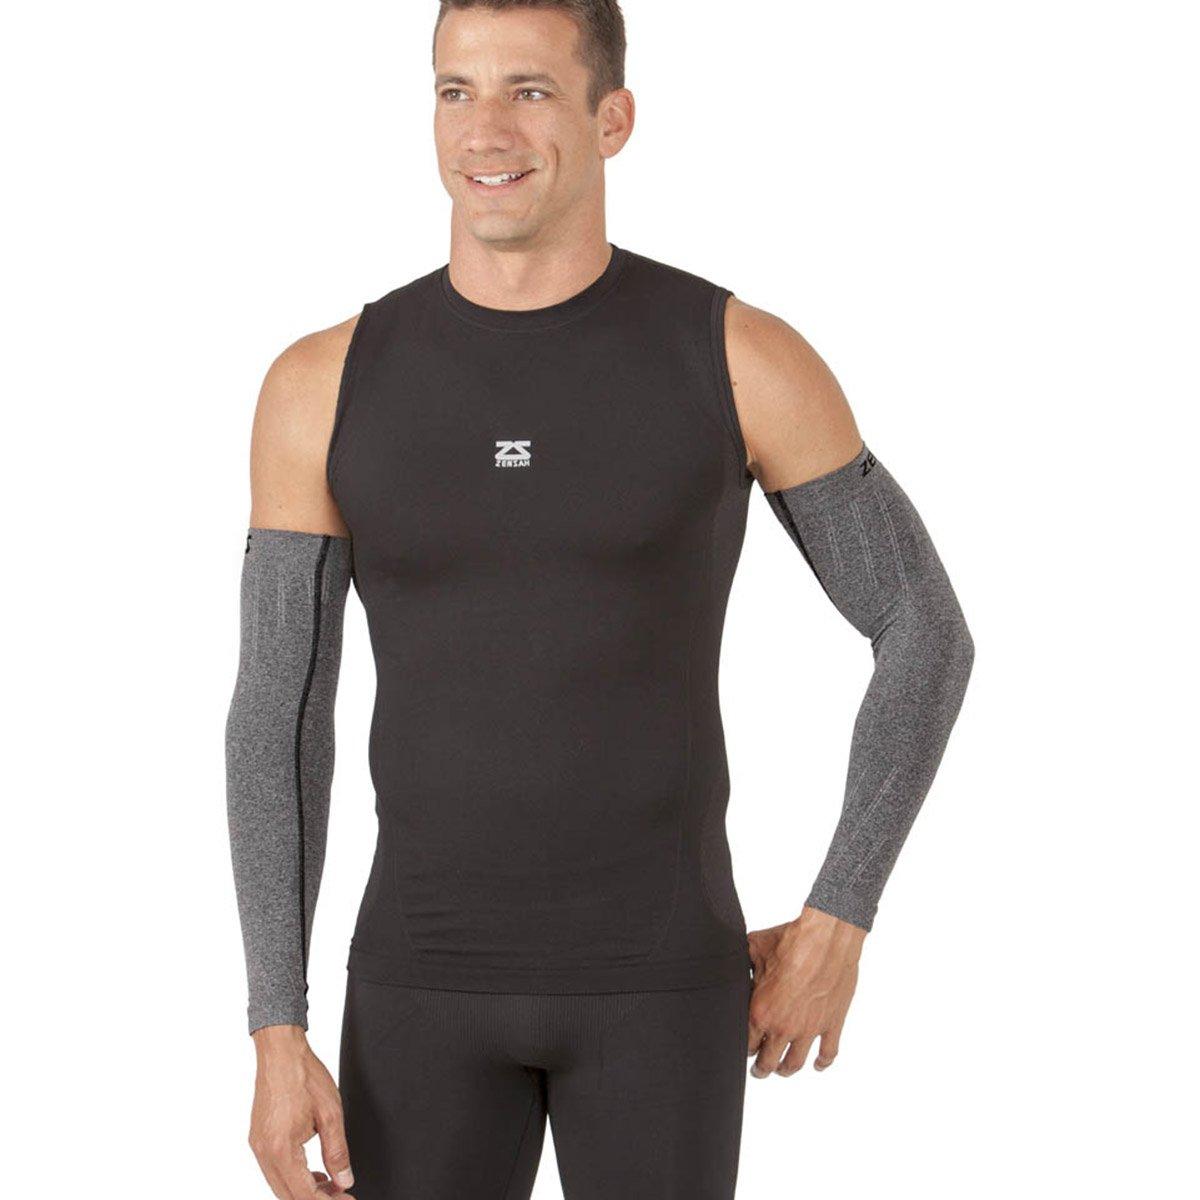 Amazon.com: Zensah Compression Arm Sleeves - Sun Sleeves, UV Protection: Sports & Outdoors